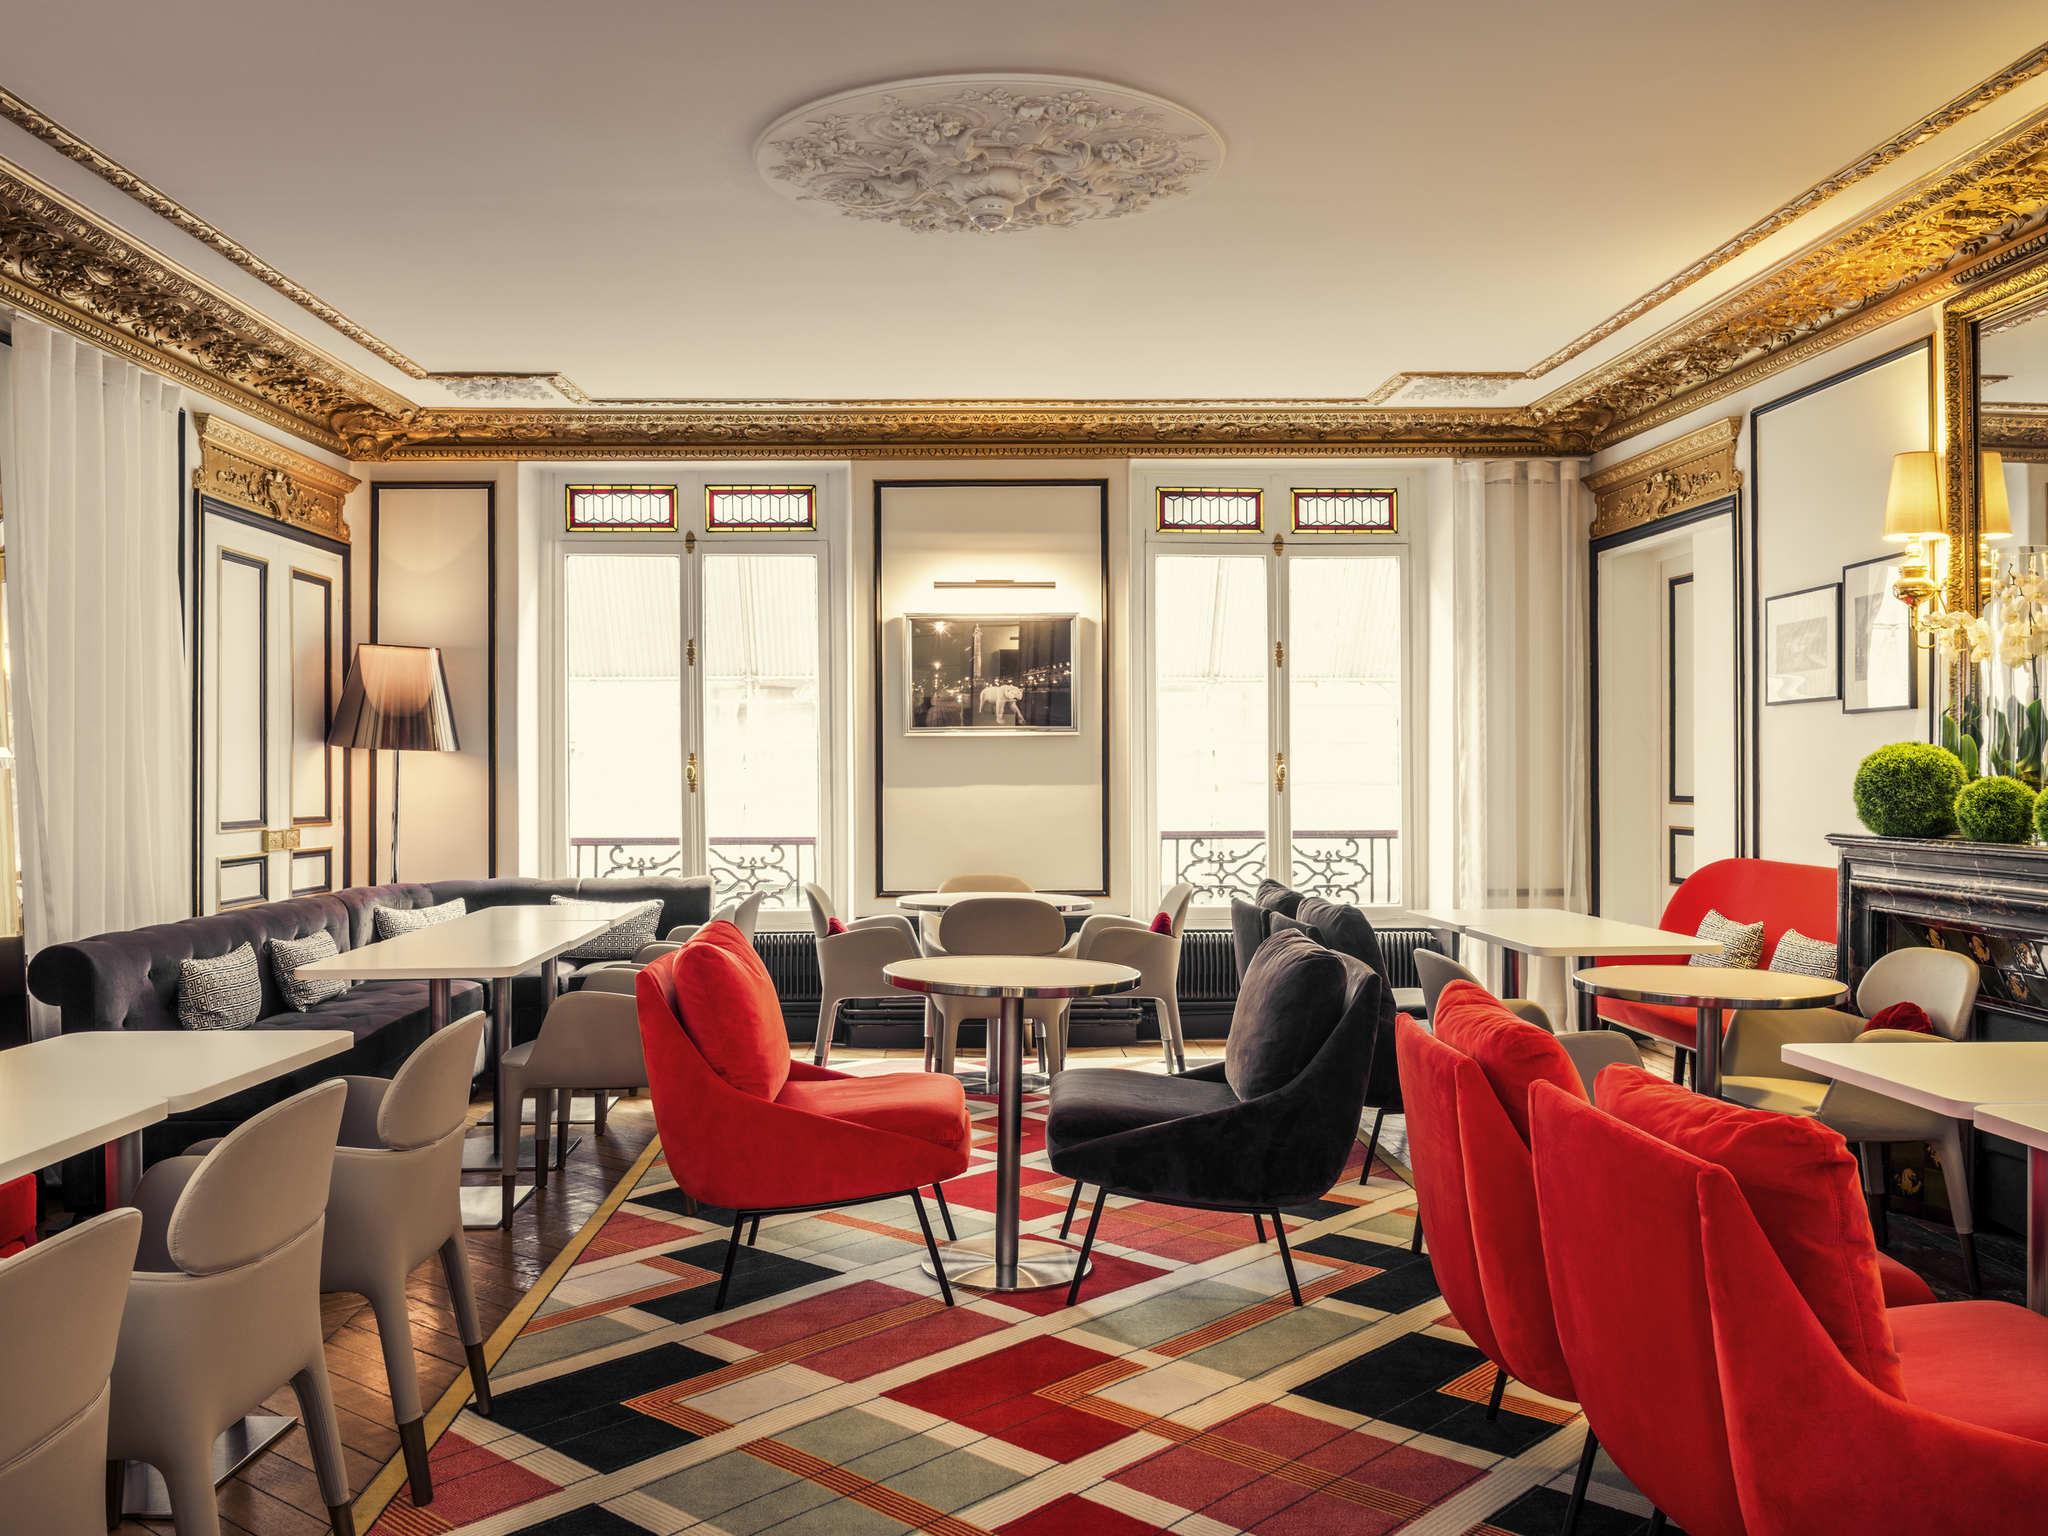 فندق - فندق مركيور Mercure باريس أوبرا لوفر